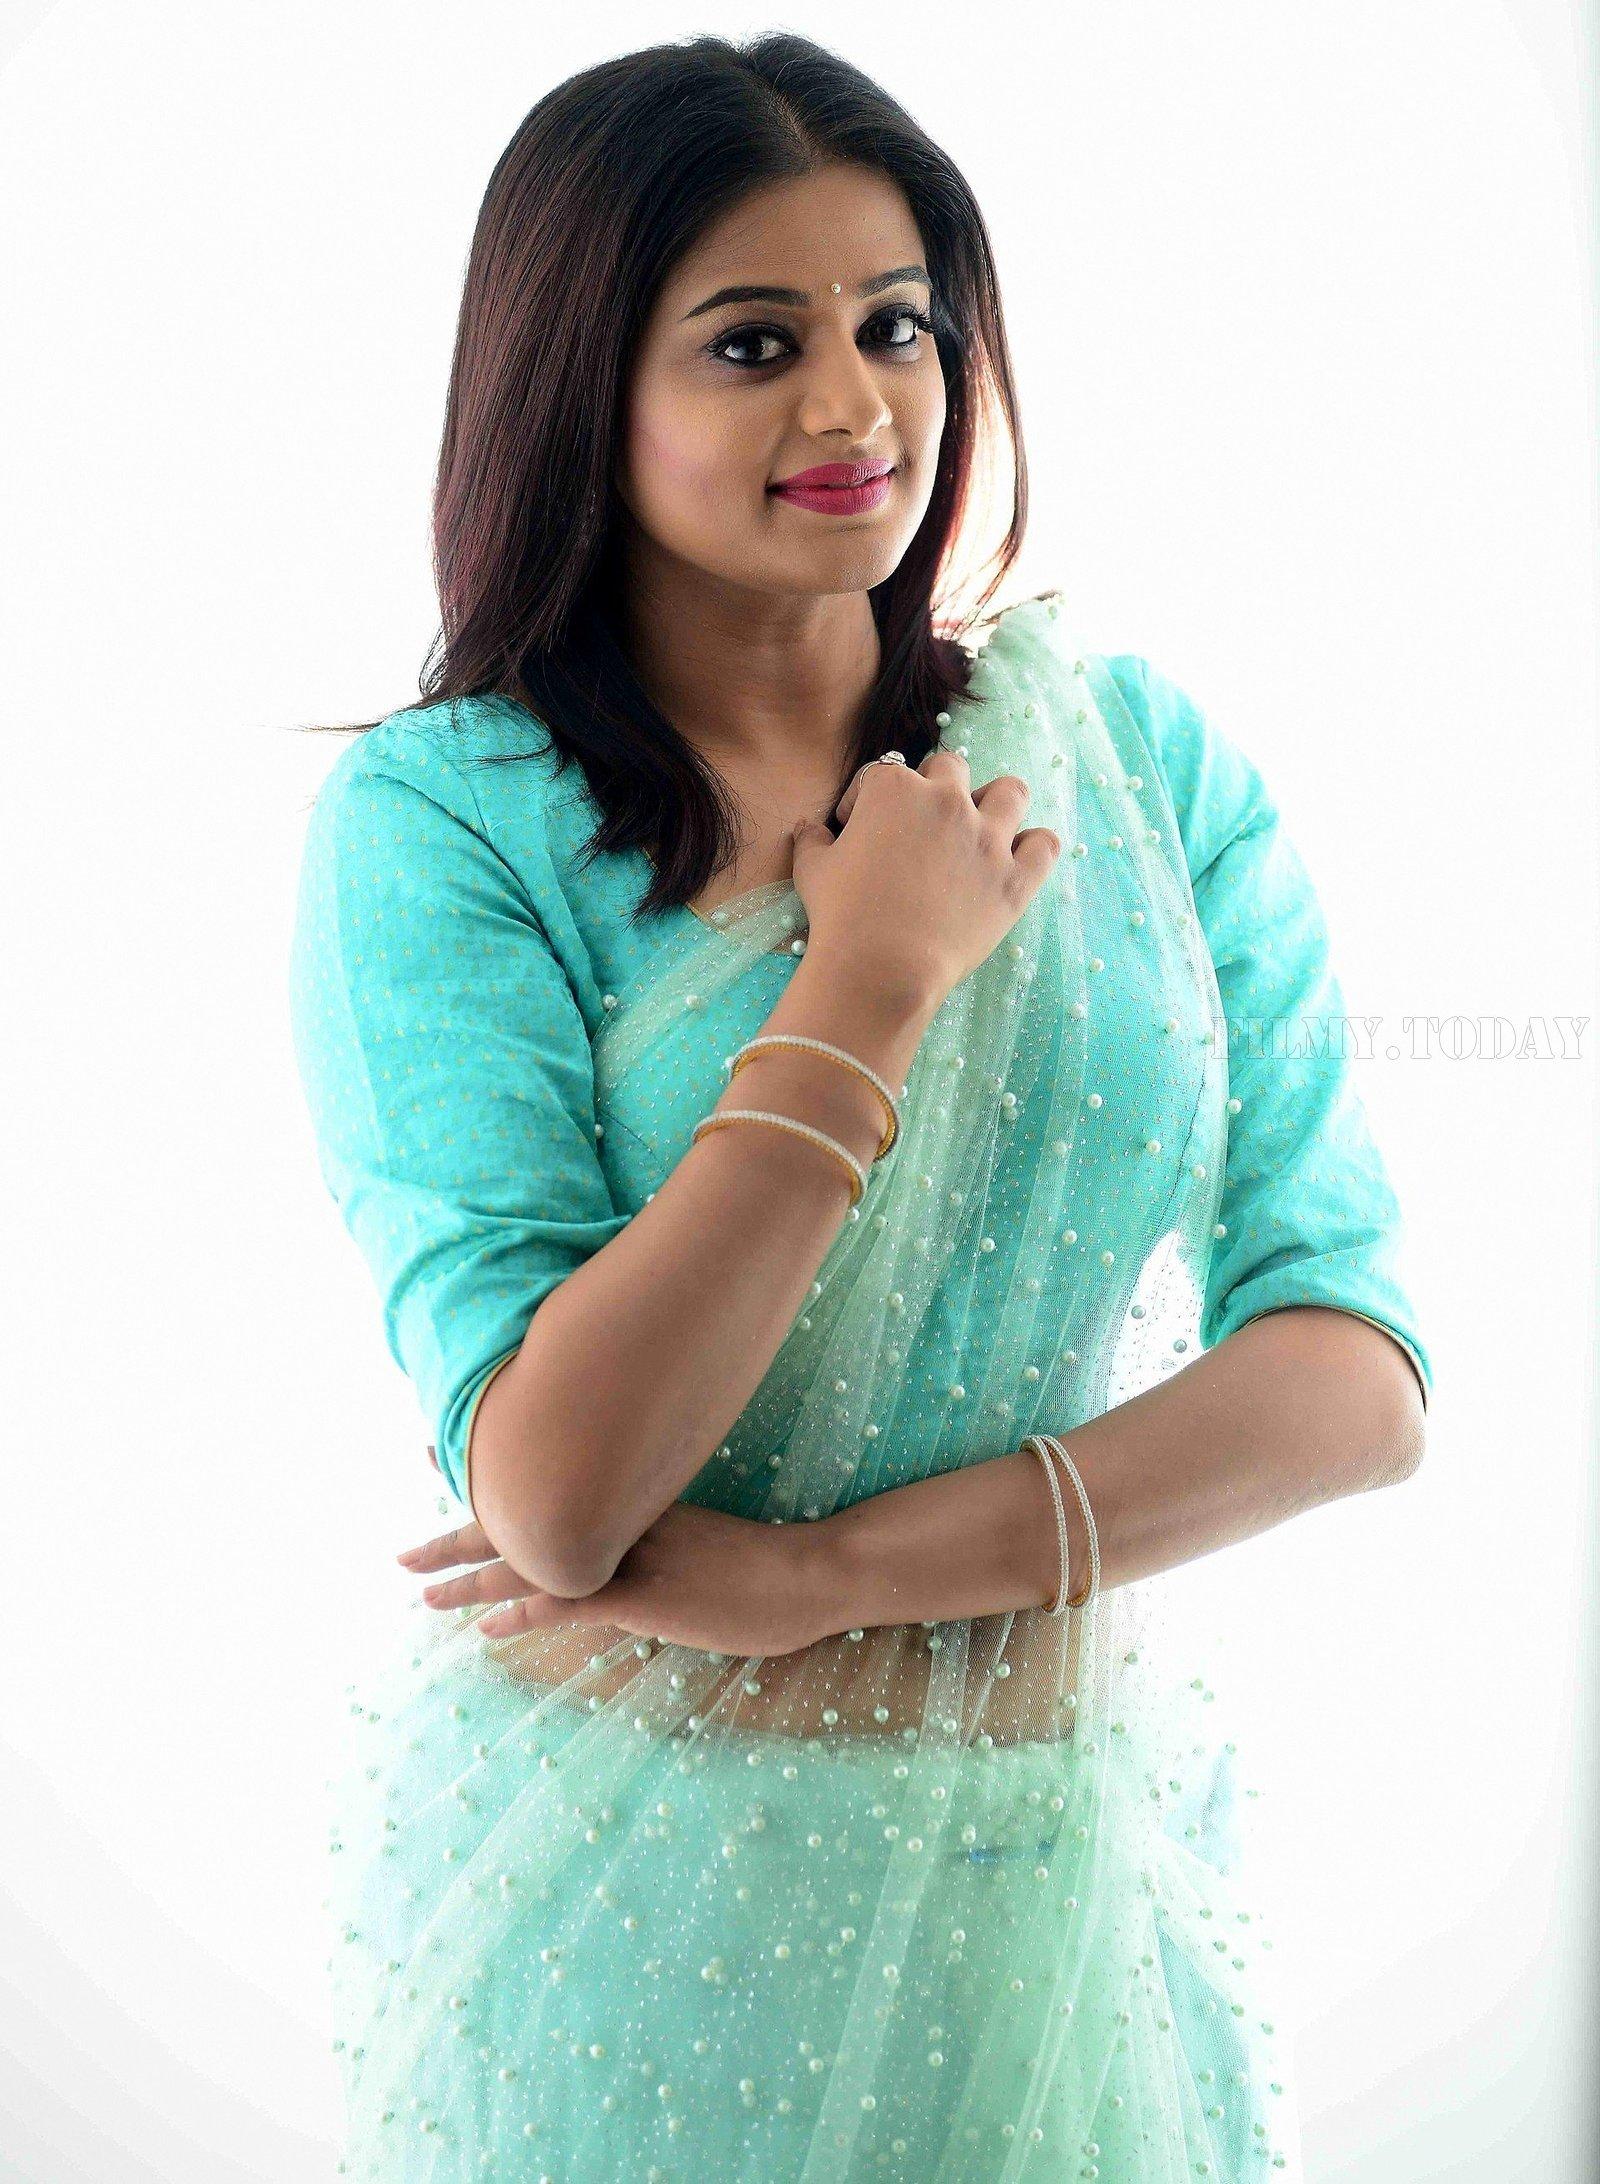 Actress Priya Mani Hot in Transparent Saree Photoshoot | Picture 1528088